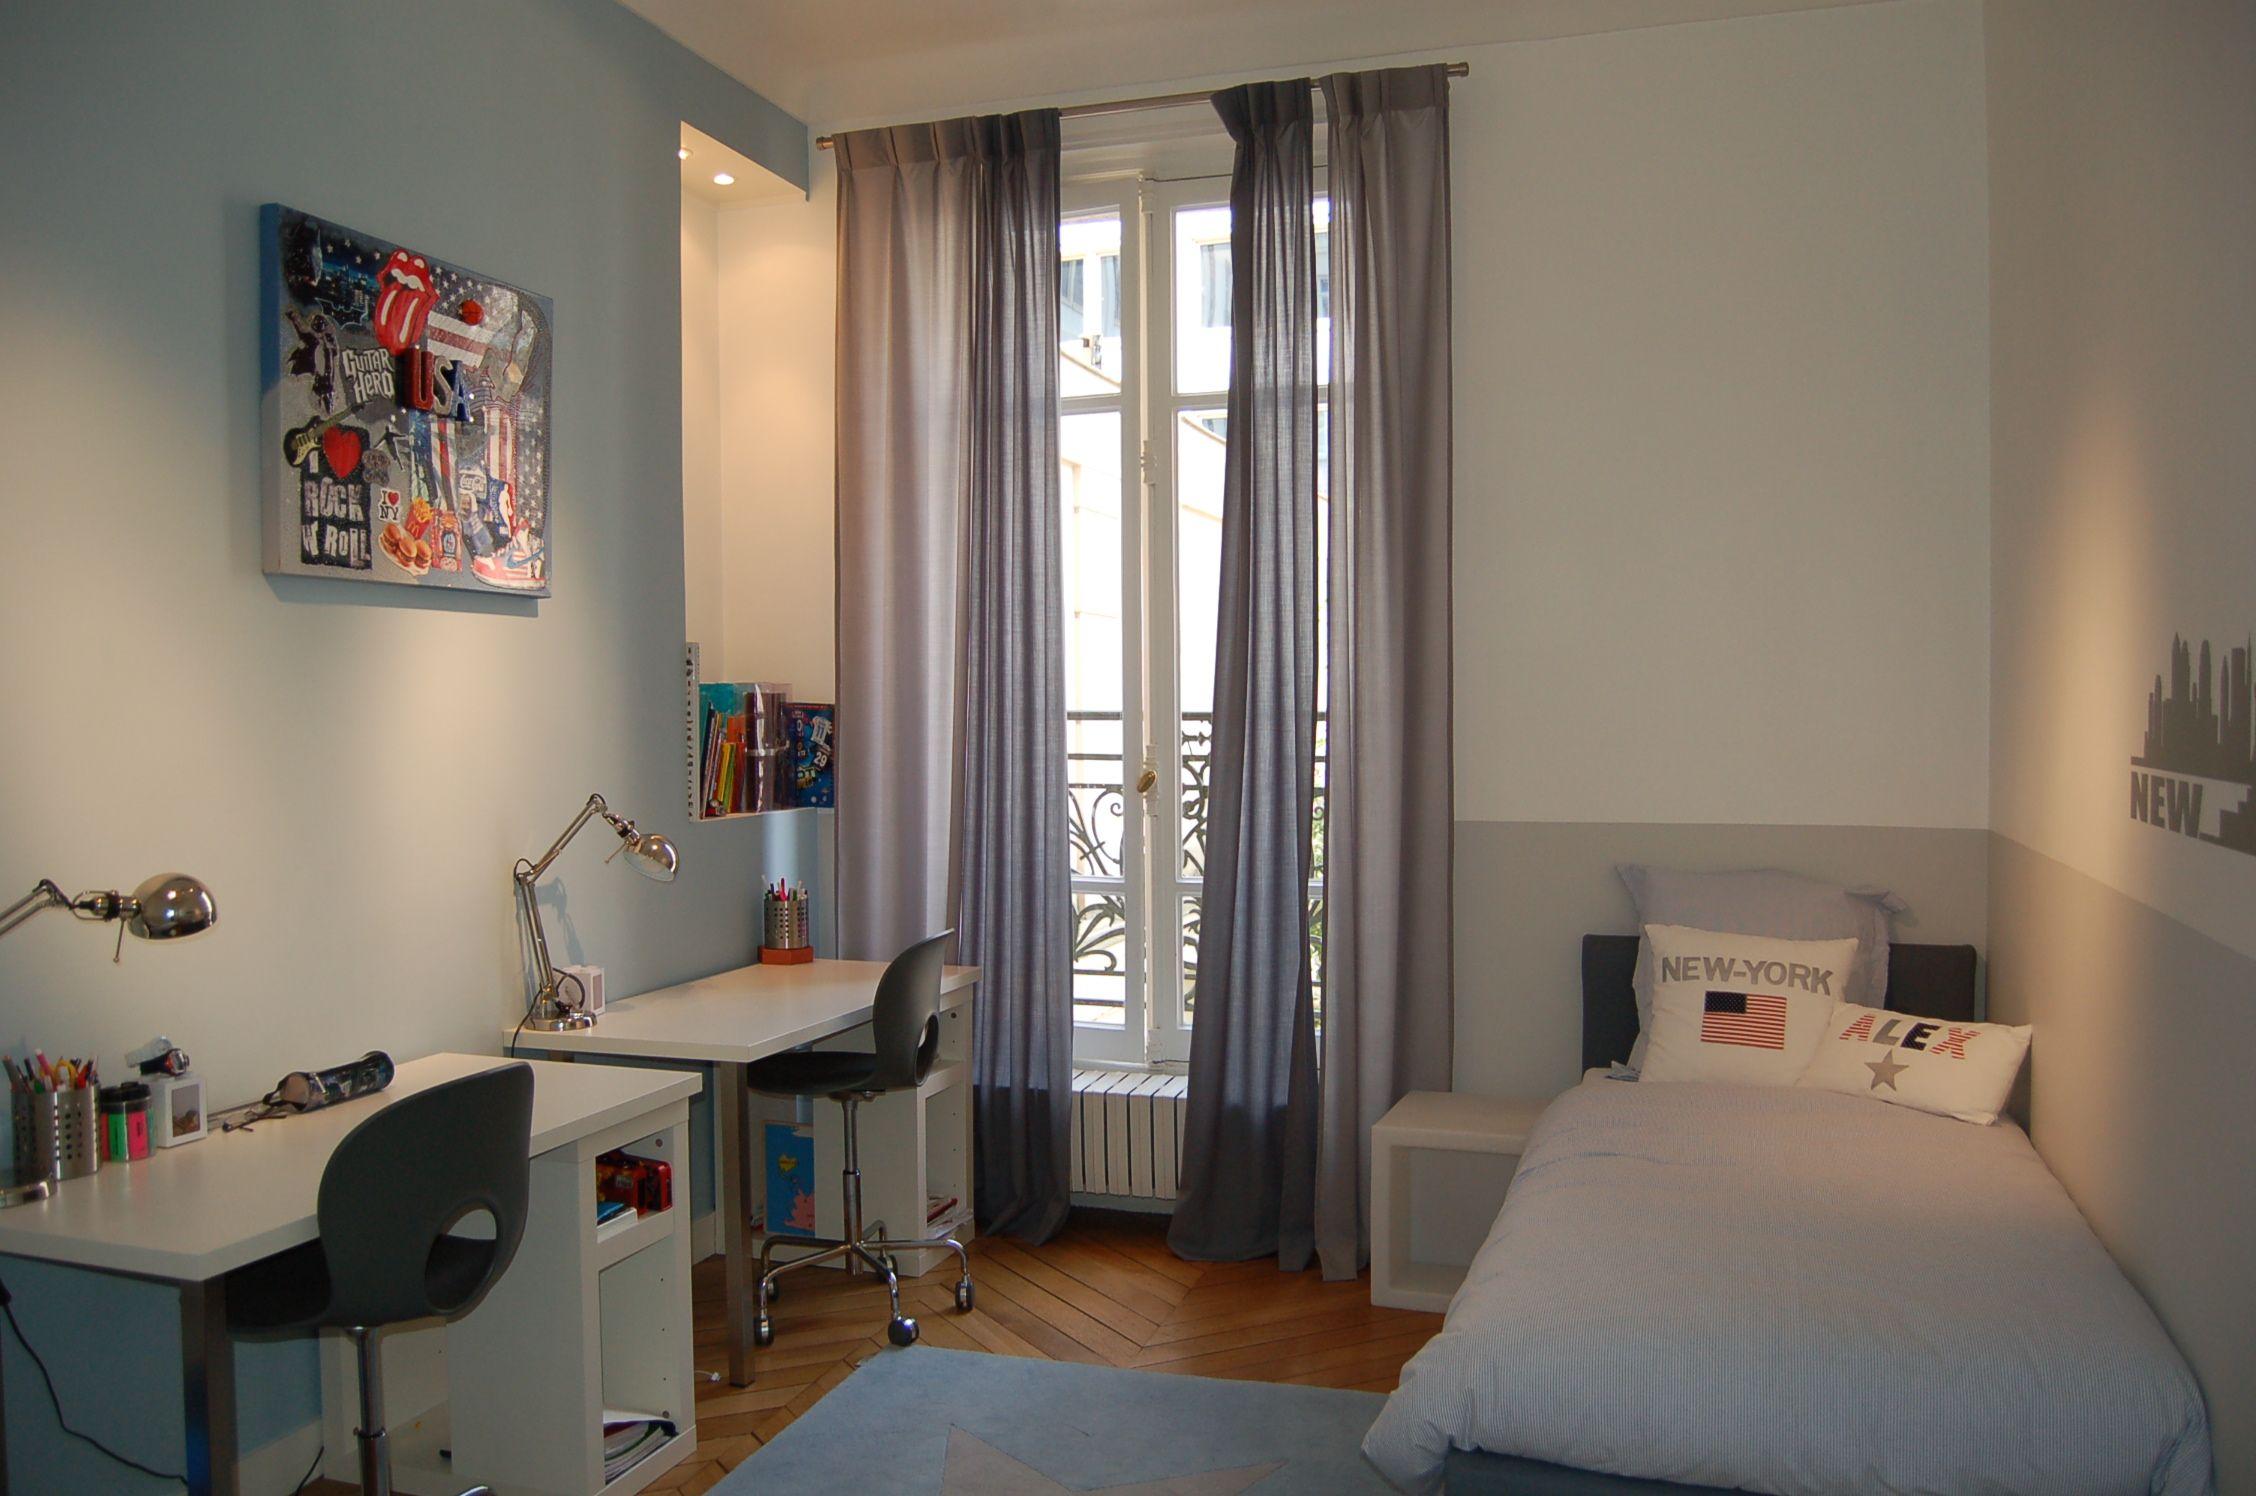 chambre new-york, new-york, chambre grise, chambre garçon, chambre grise